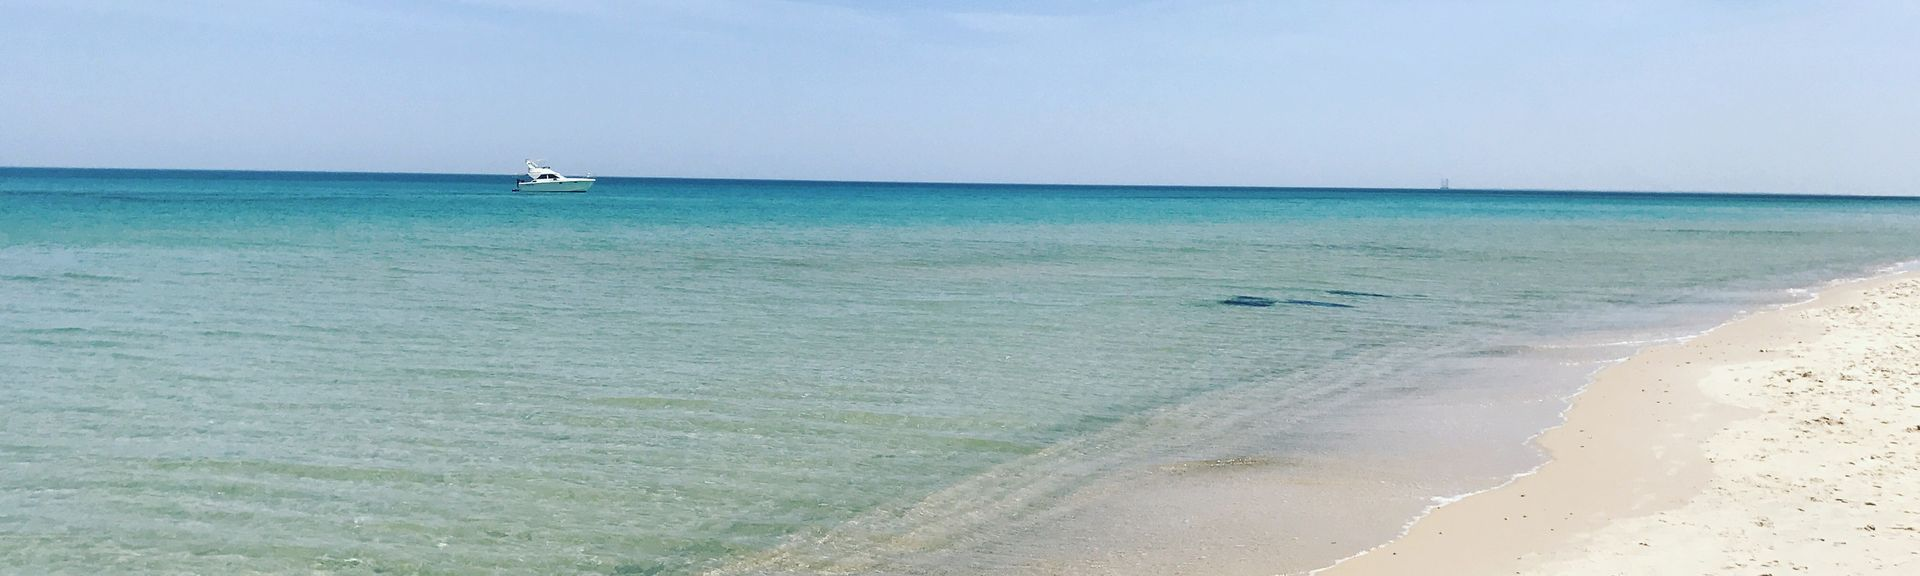 M'saken, Sousse, Tunísia